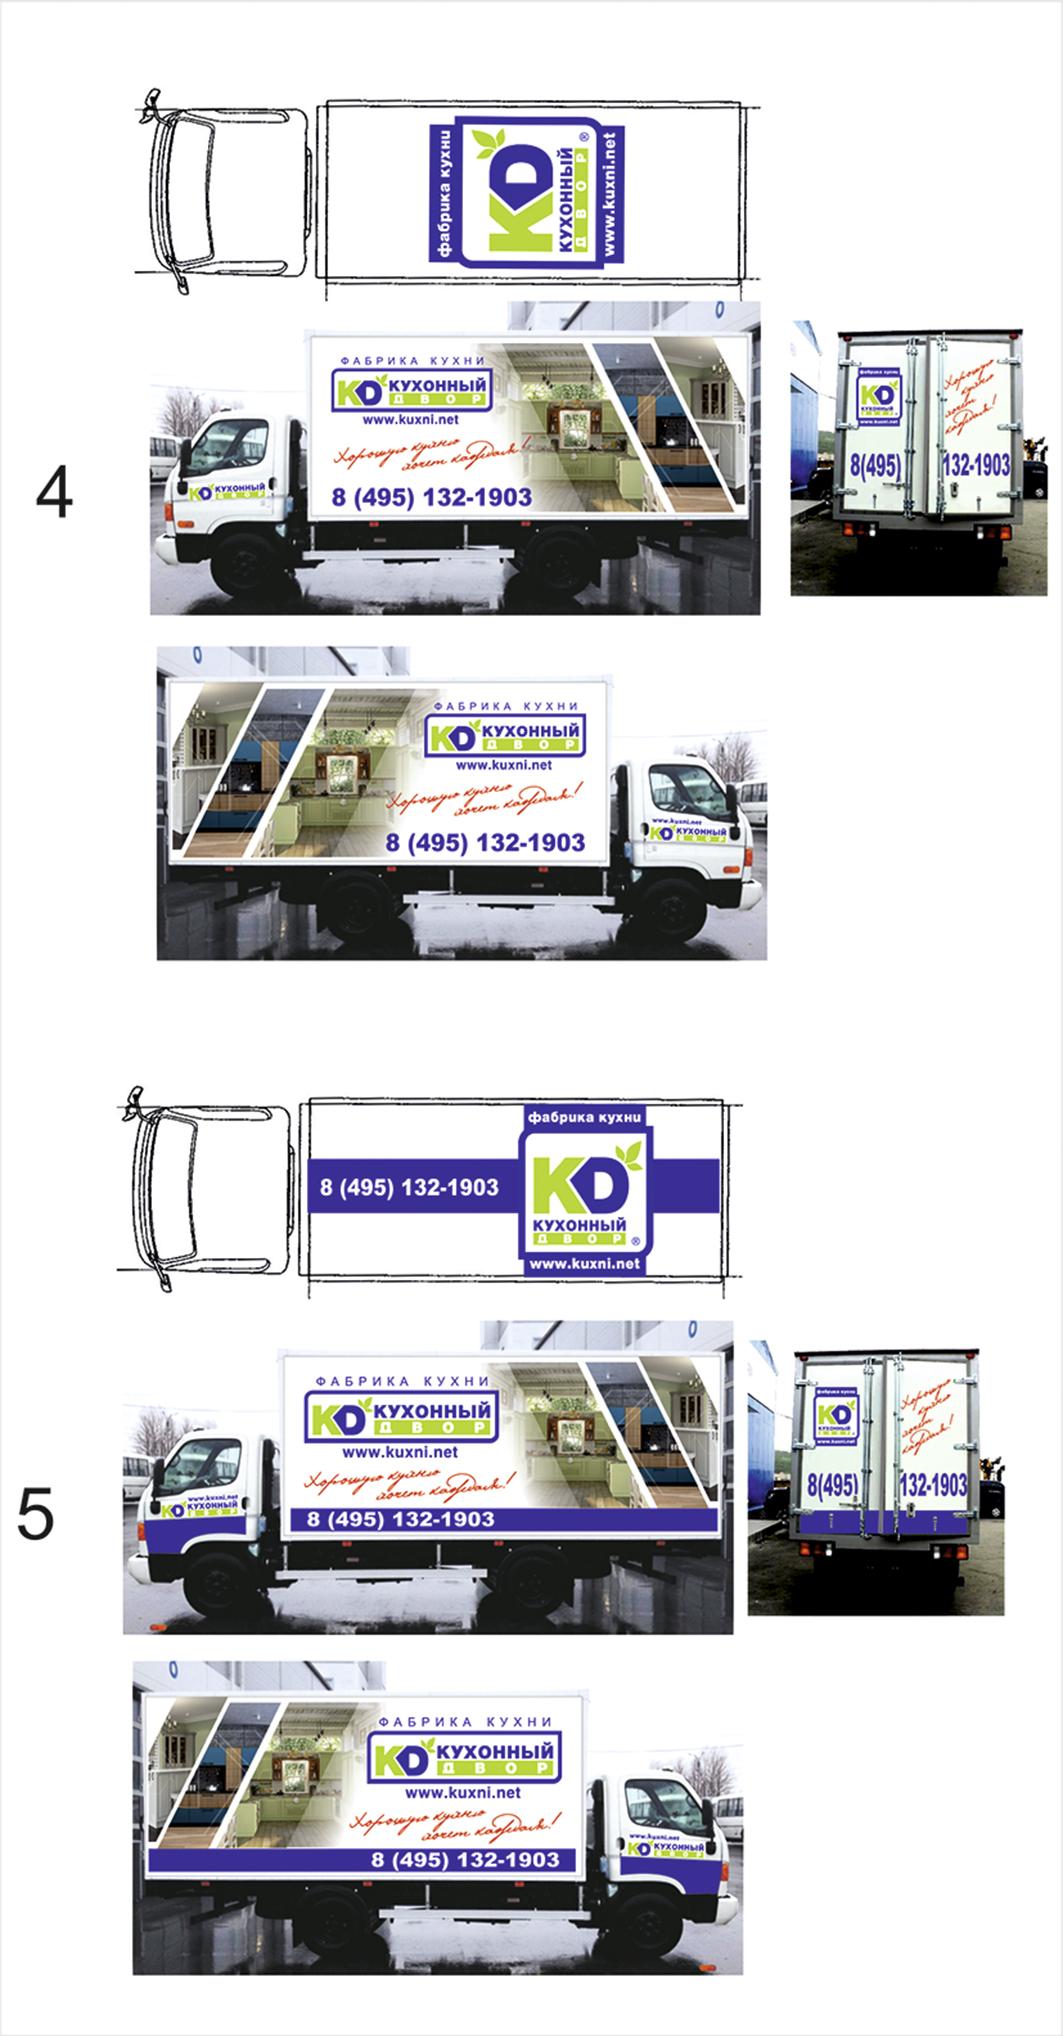 "Брендирование грузового авто для компании ""Кухонный двор"" фото f_56759cd59c0be551.jpg"